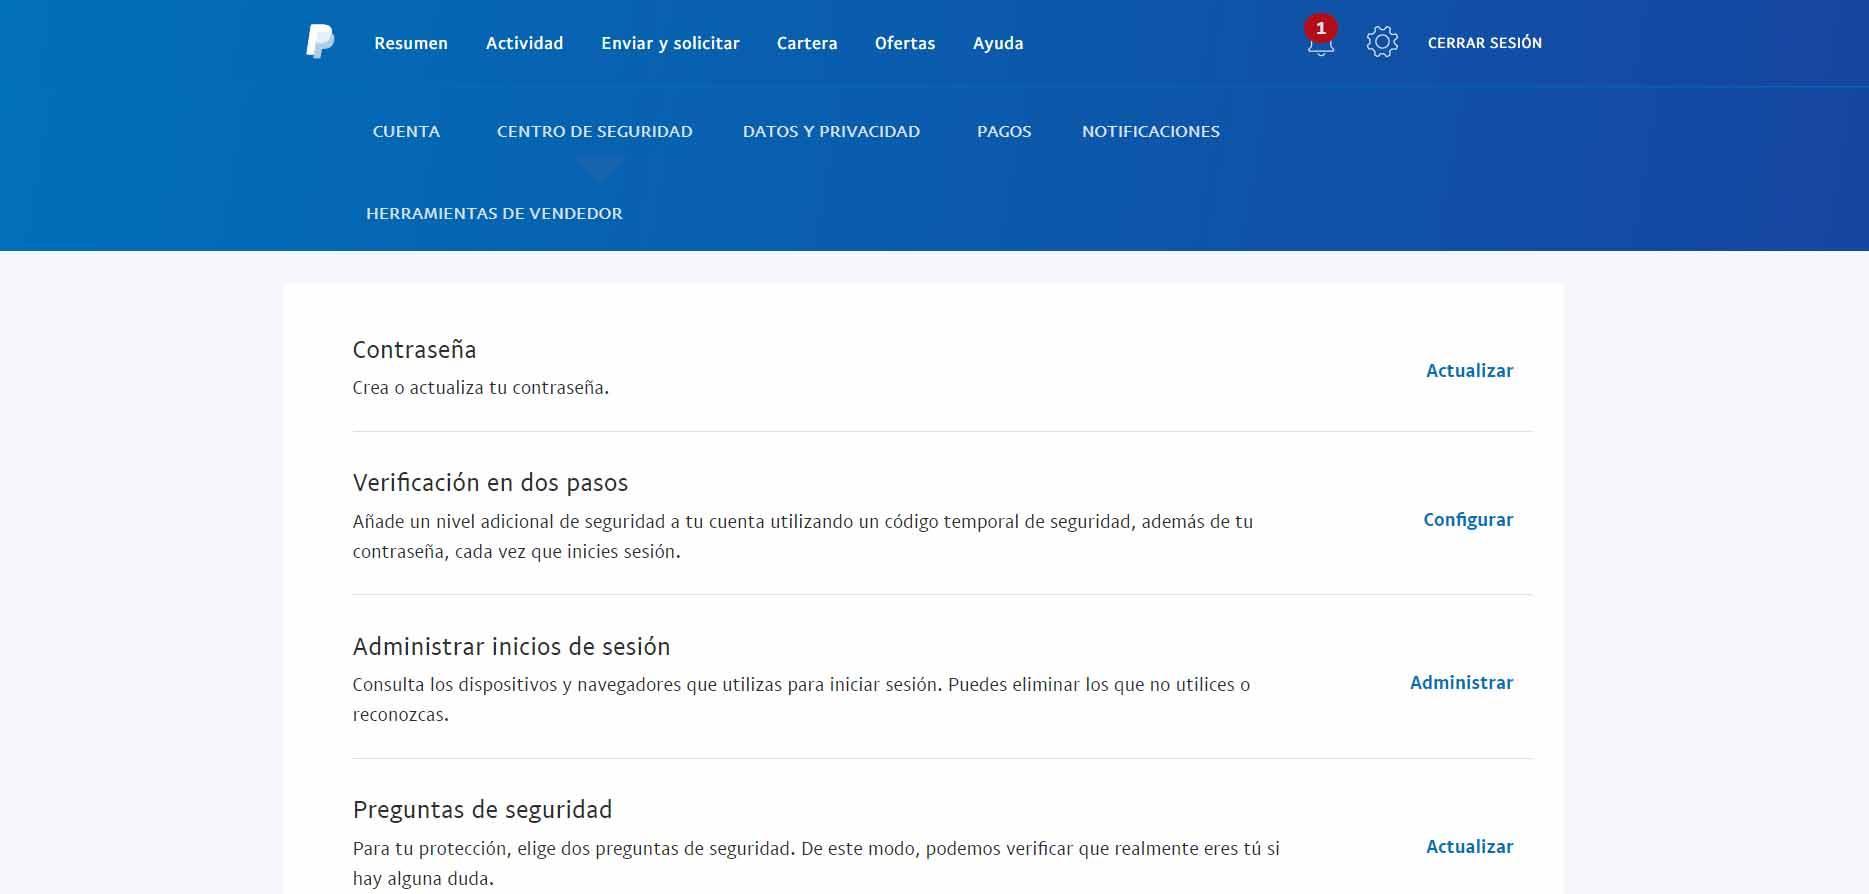 Verificación en dos pasos en PayPal